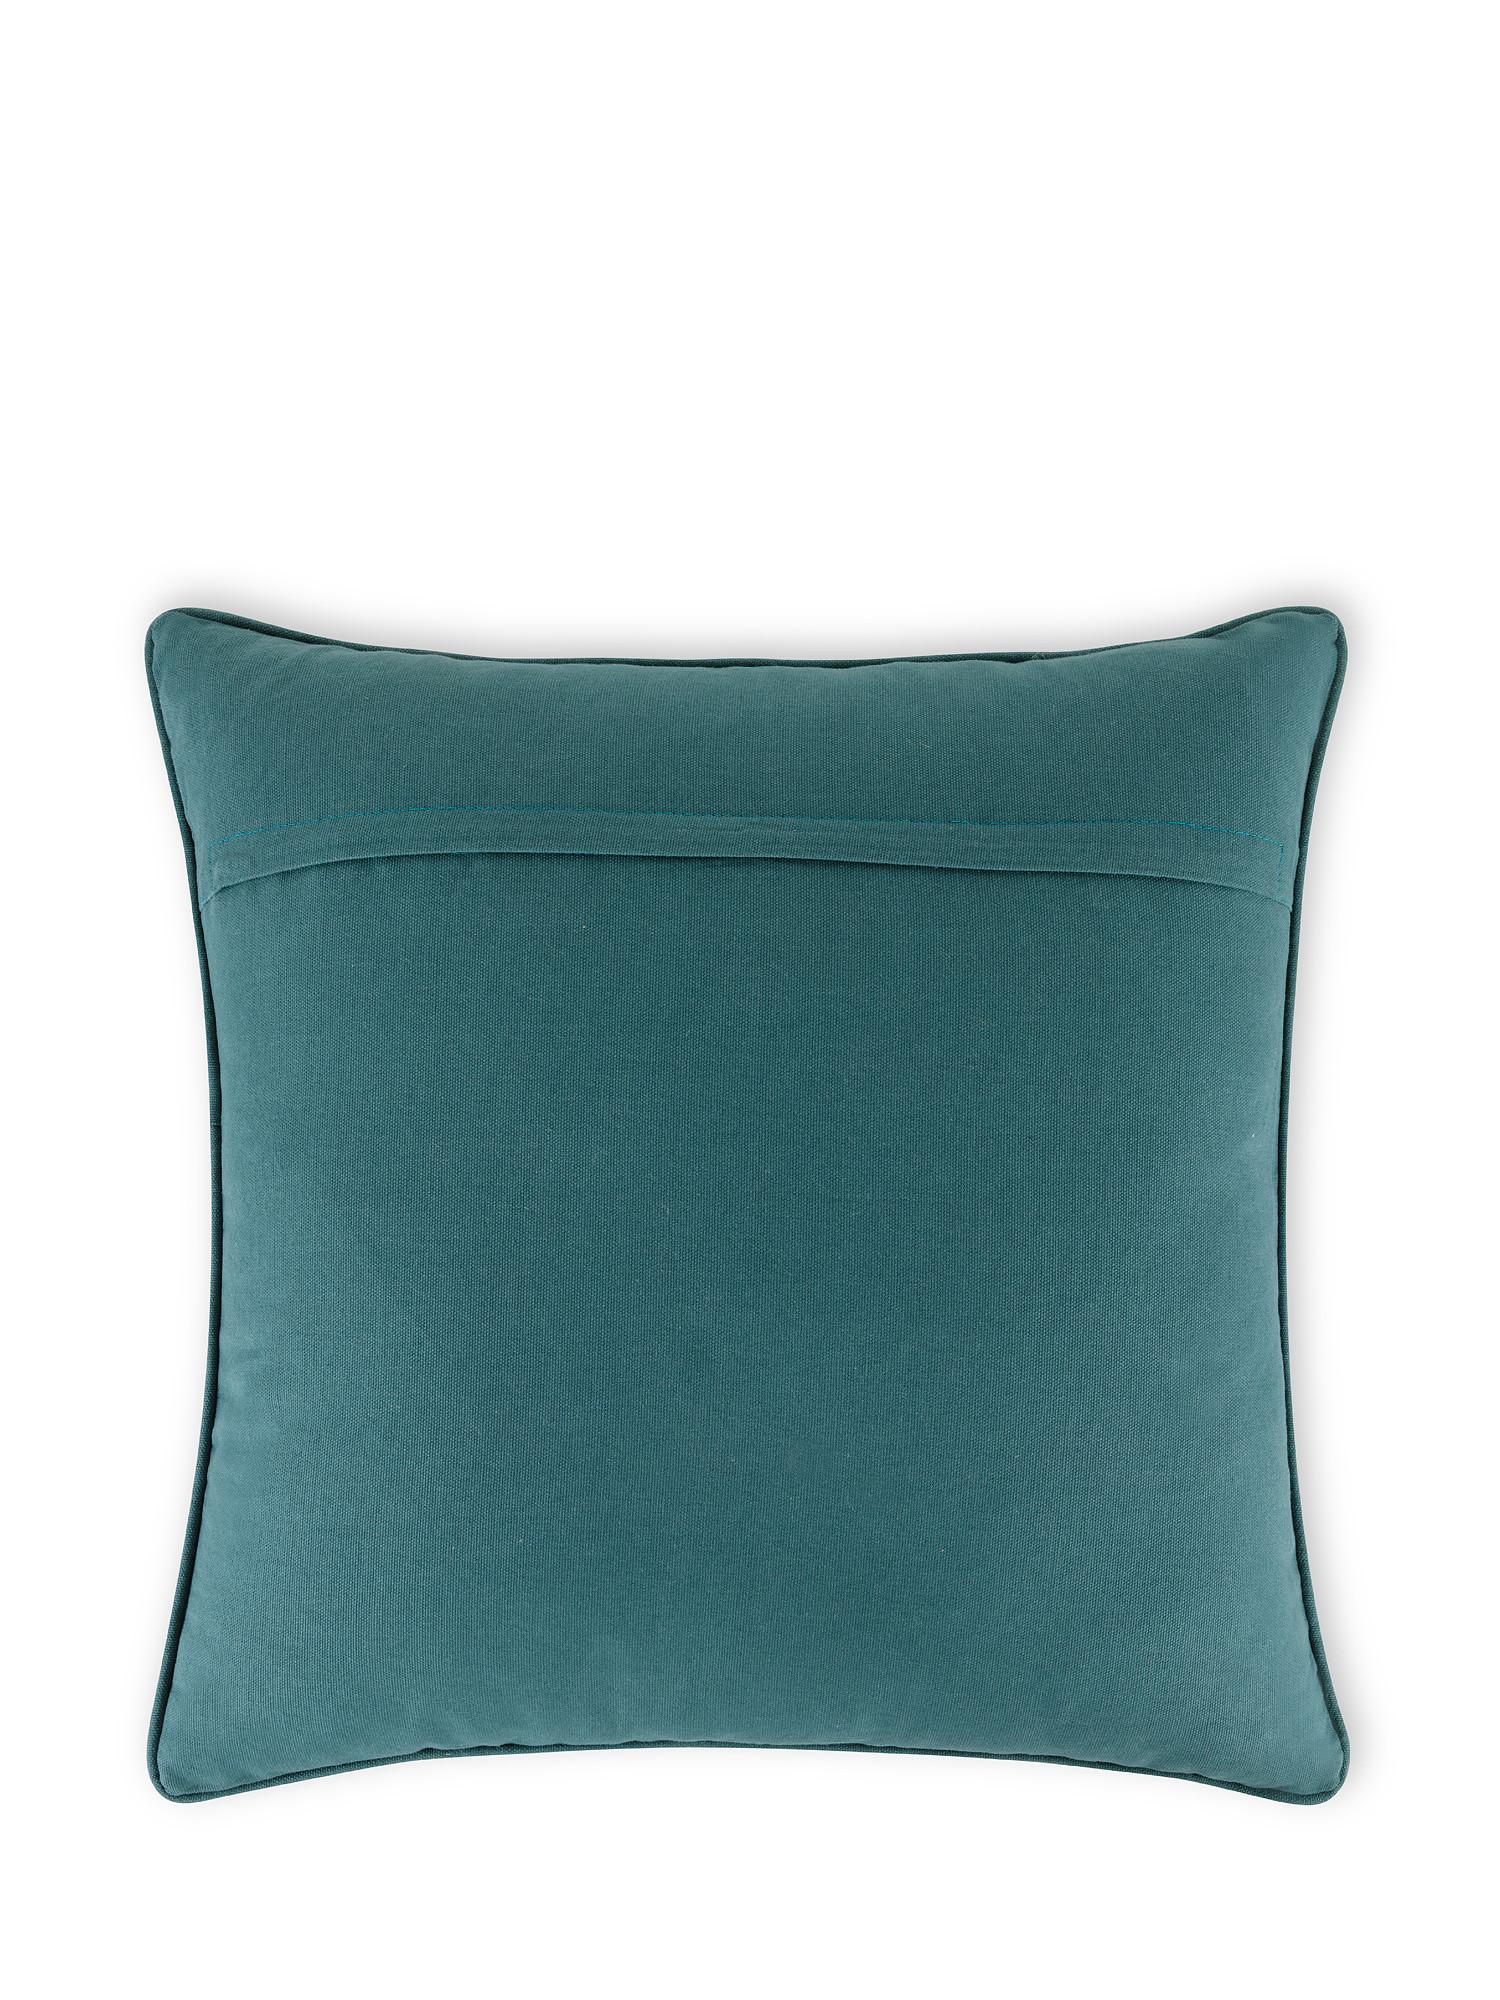 Cuscino cotone effetto tie dye 45x45cm, Multicolor, large image number 1